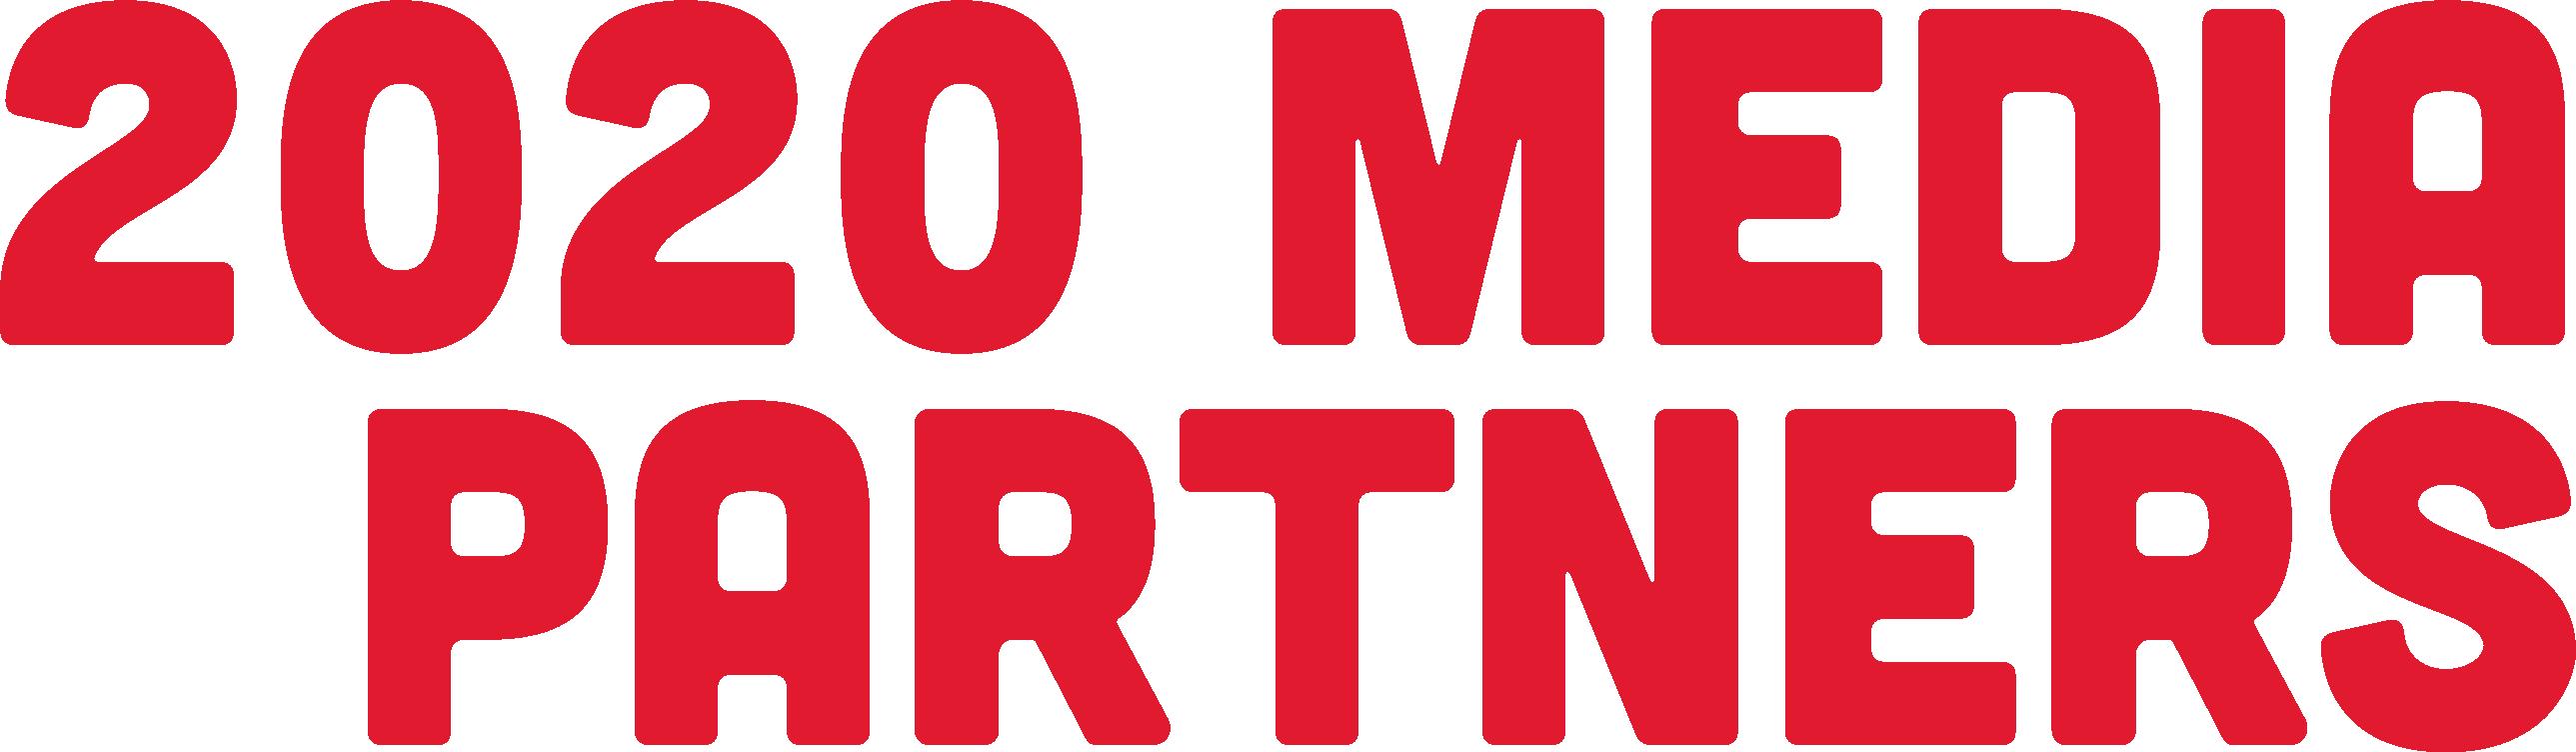 Media Partners text